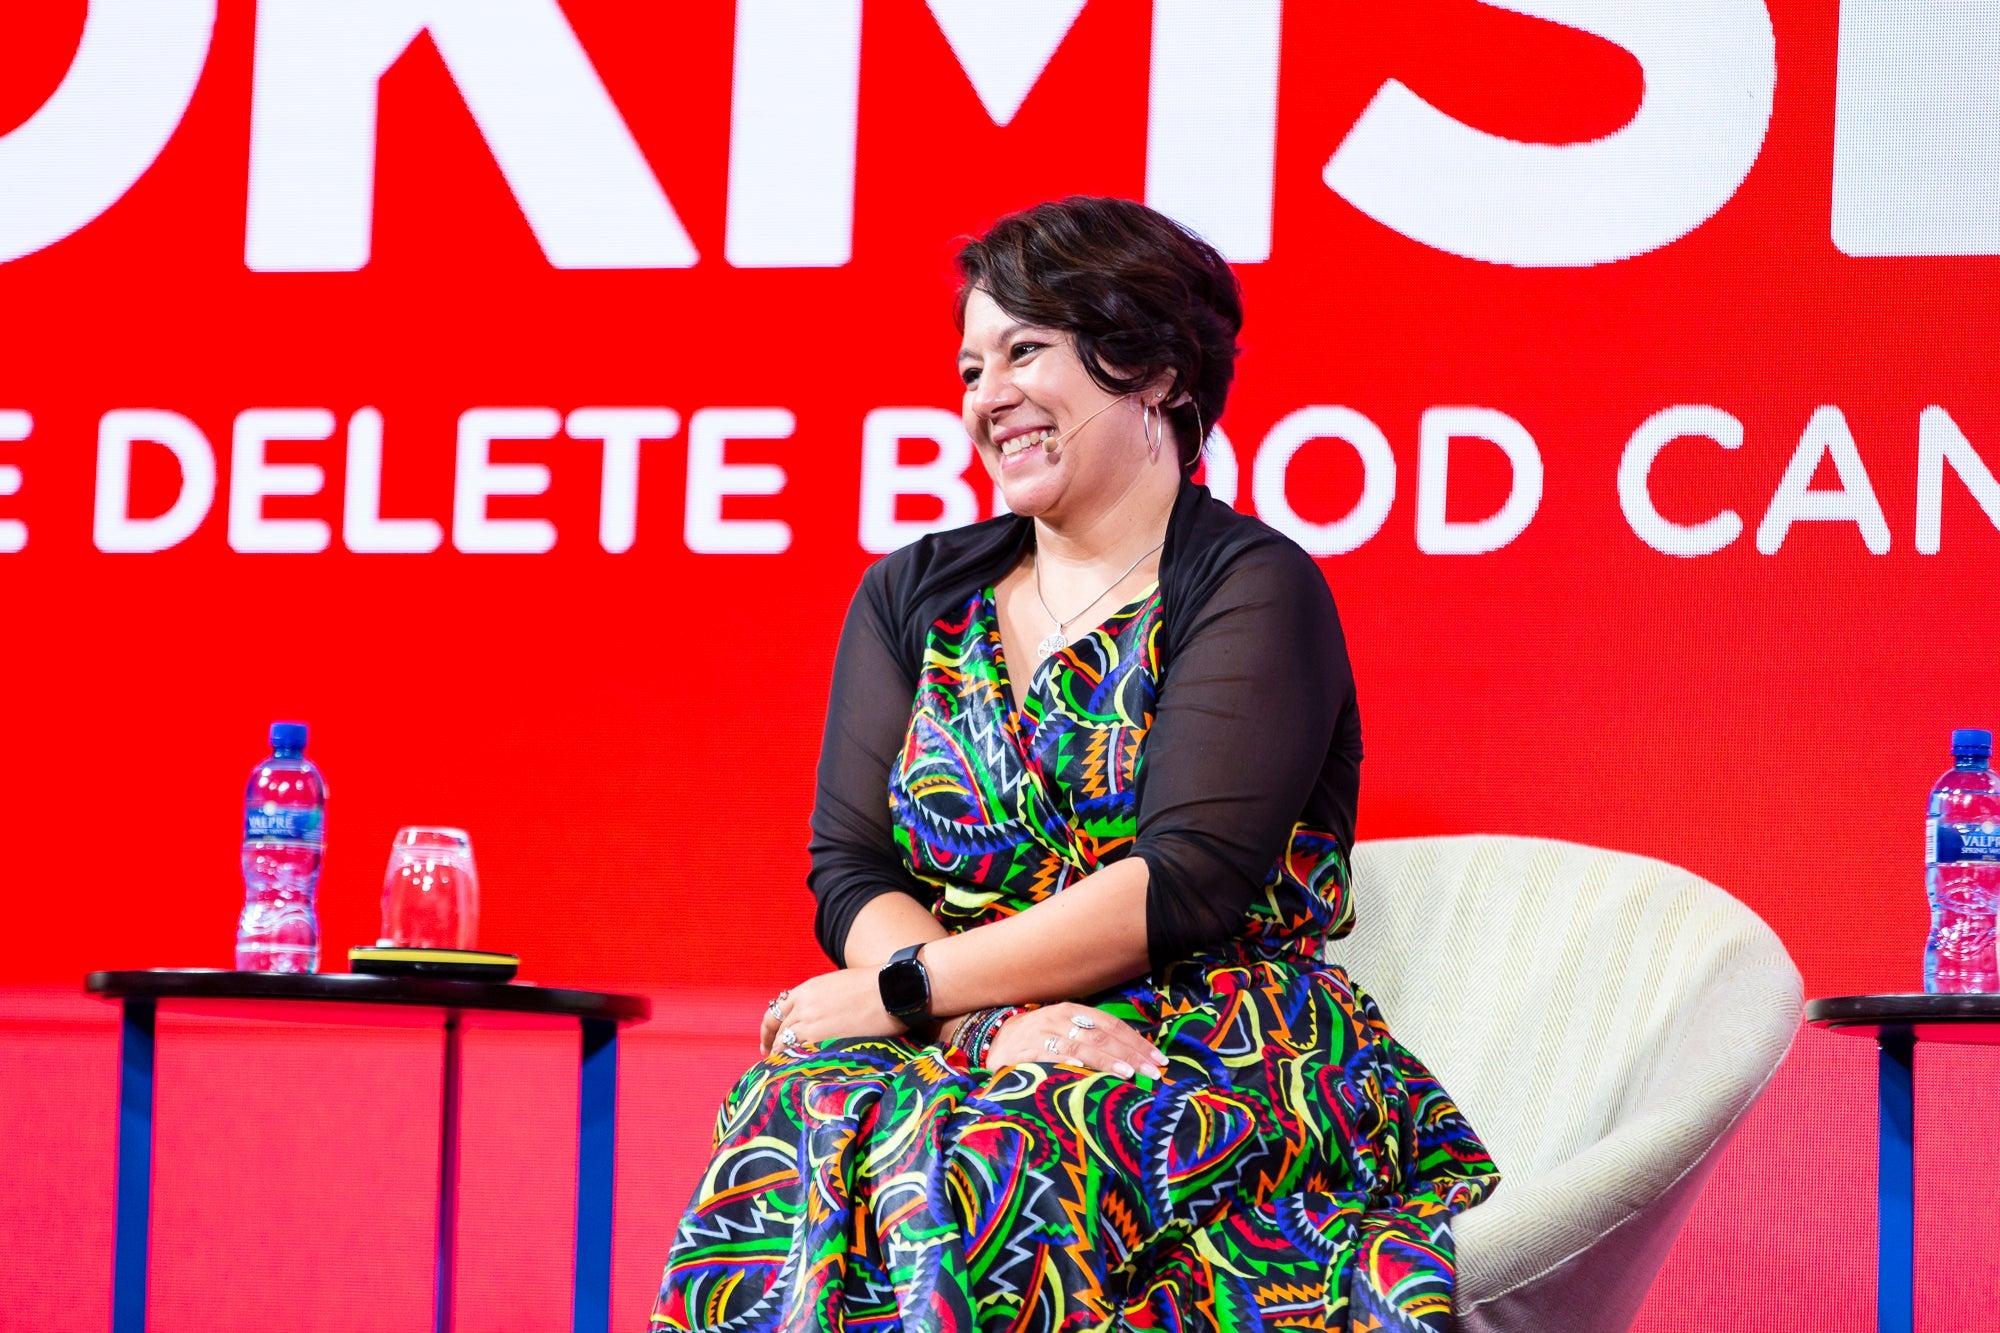 Alana James